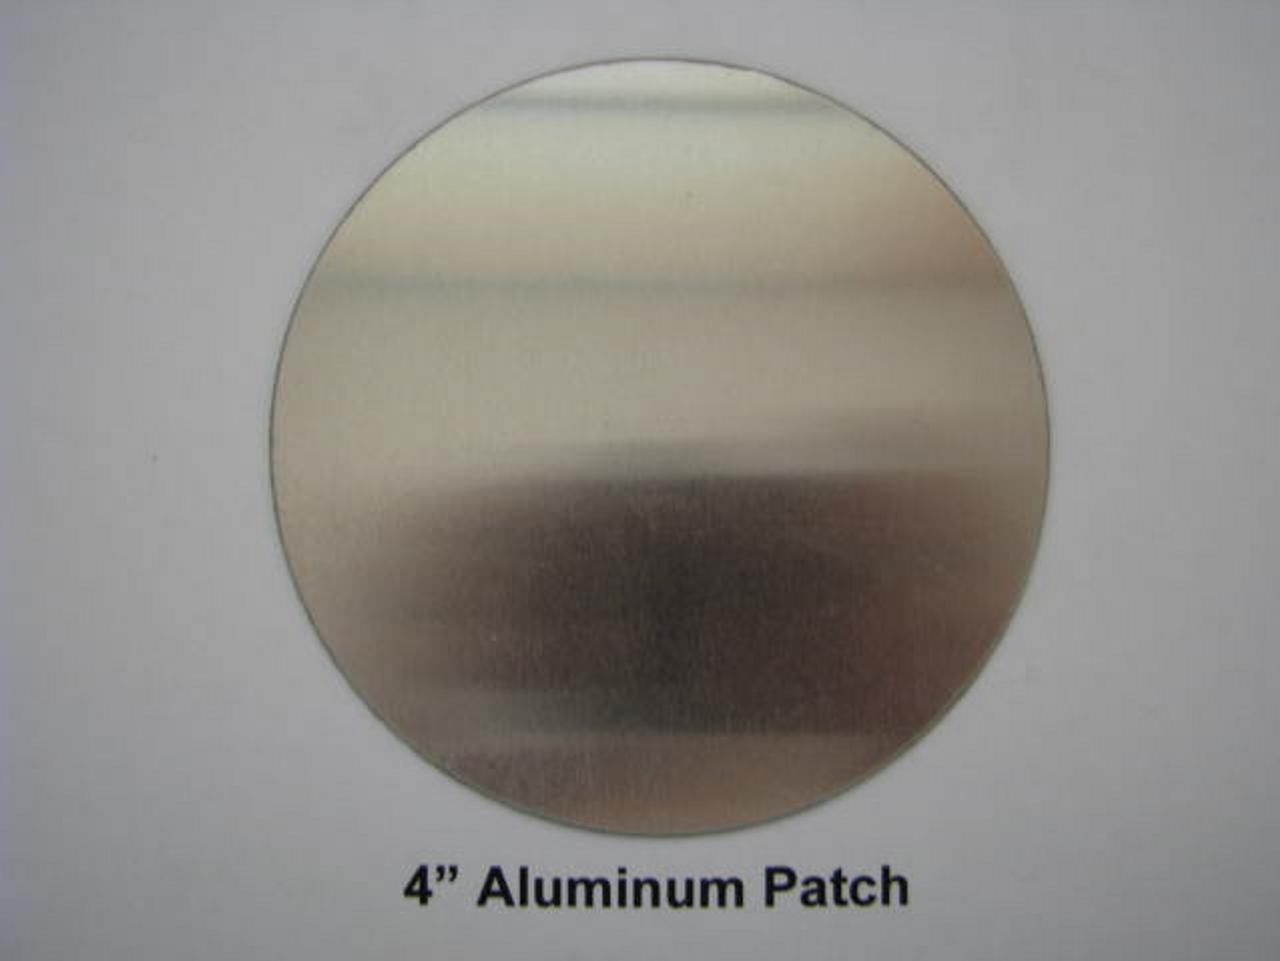 "Aluminum Round Patch - 4"" - (CBP004) FRONT OVERHEAD VIEW"